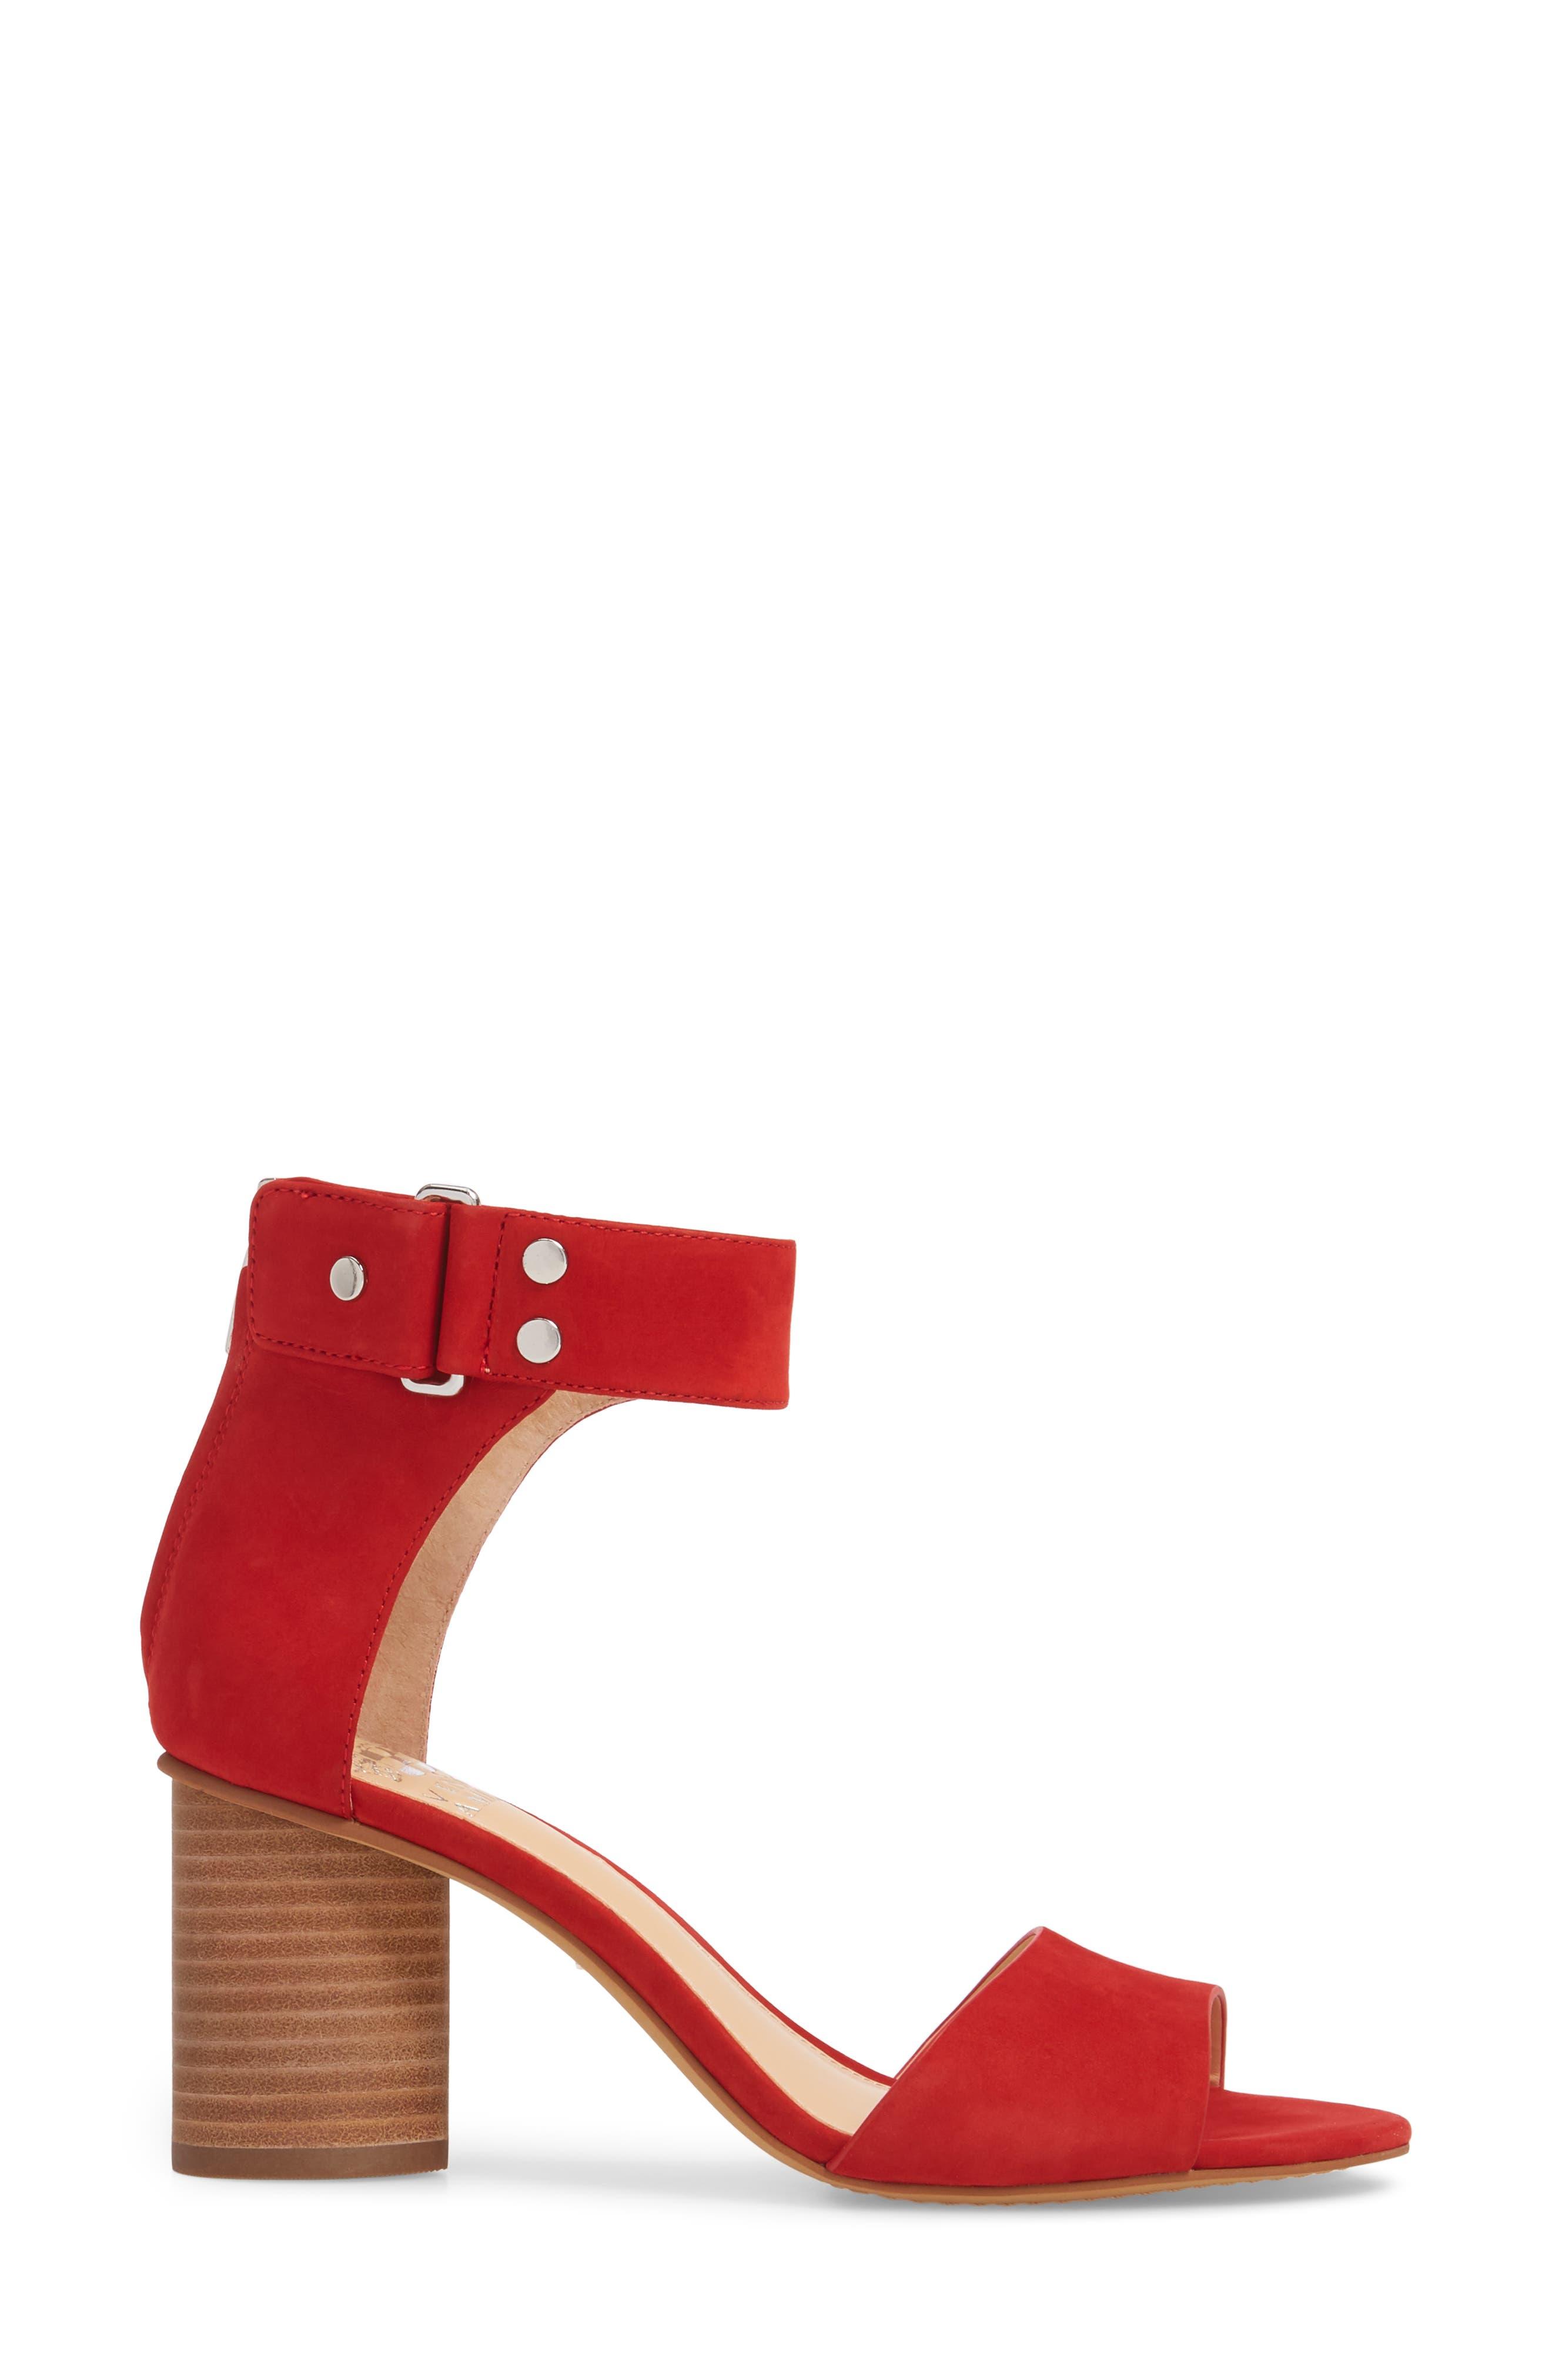 Jannali Ankle Strap Sandal,                             Alternate thumbnail 3, color,                             Cherry Red Leather